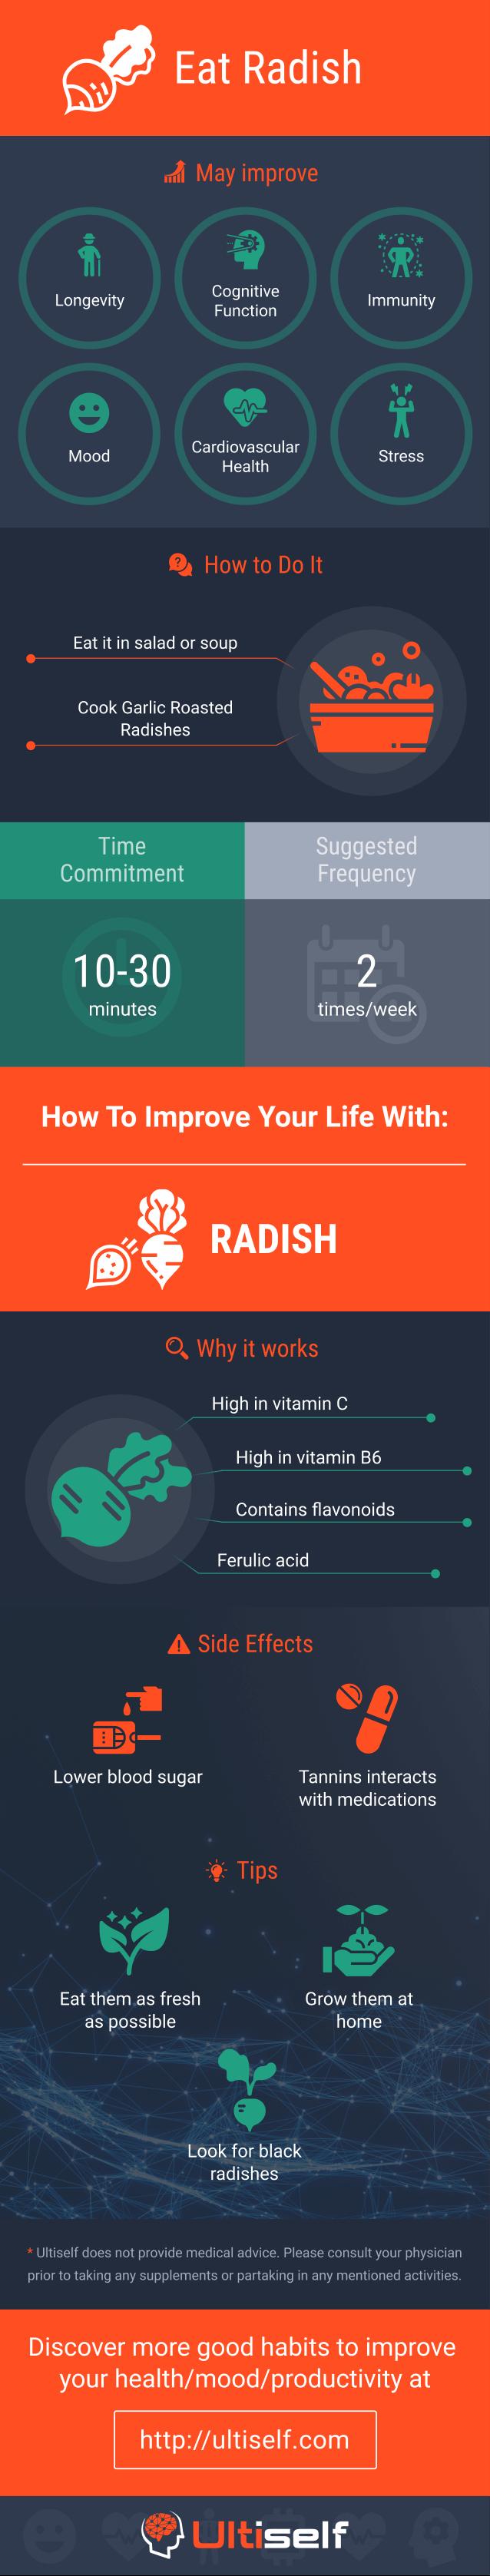 Eat Radish infographic